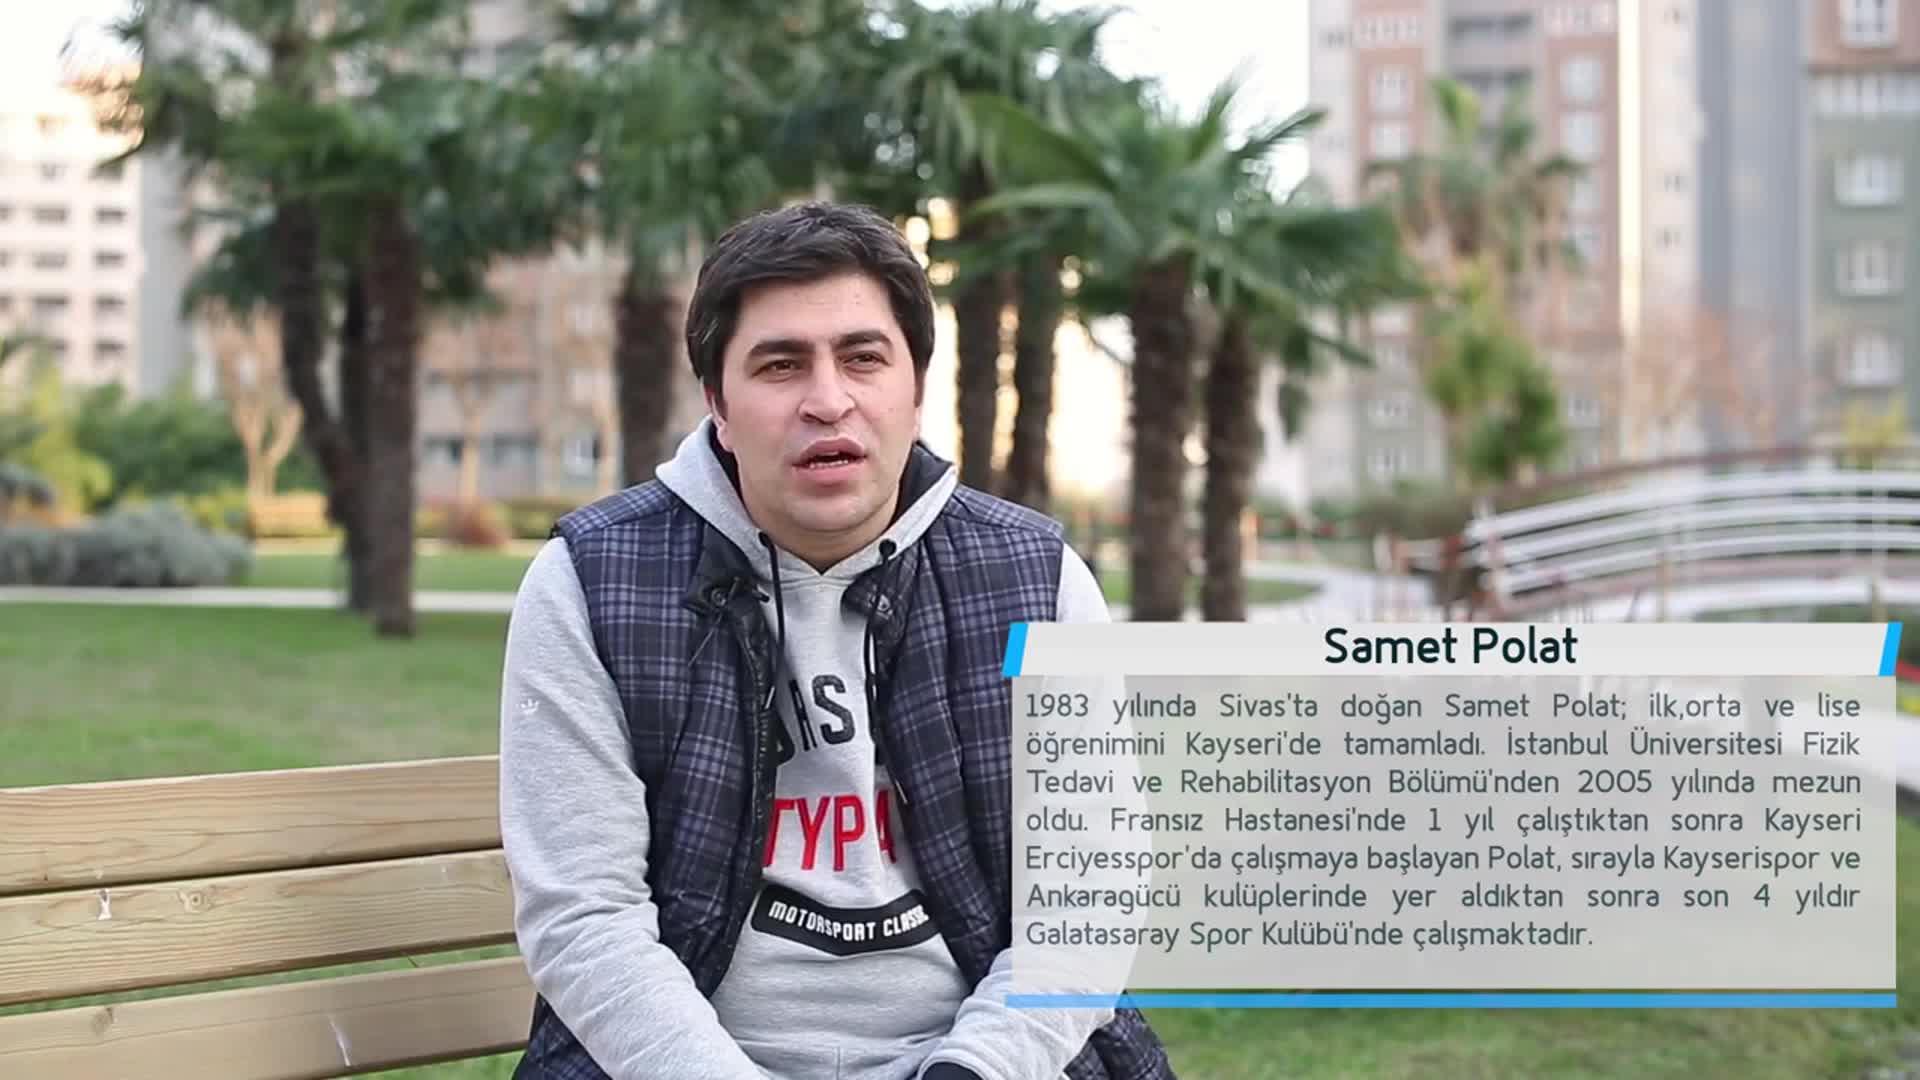 Fizyoterapi Ve Rehabilitasyon Samet Polat Izle Video Eğitim